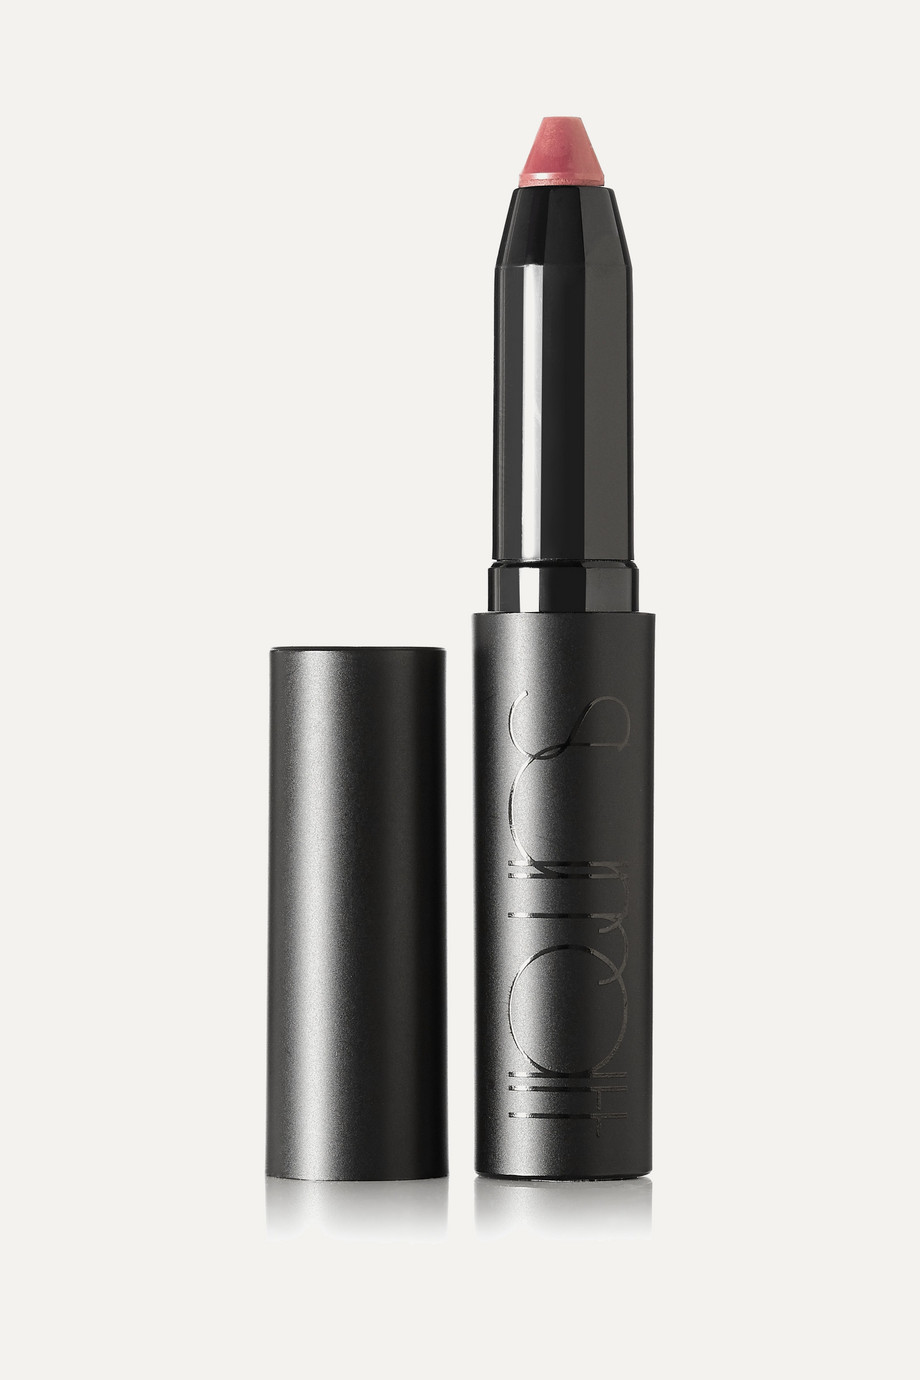 Surratt Beauty Automatique Lip Crayon – Gentillesse – Lippenstift